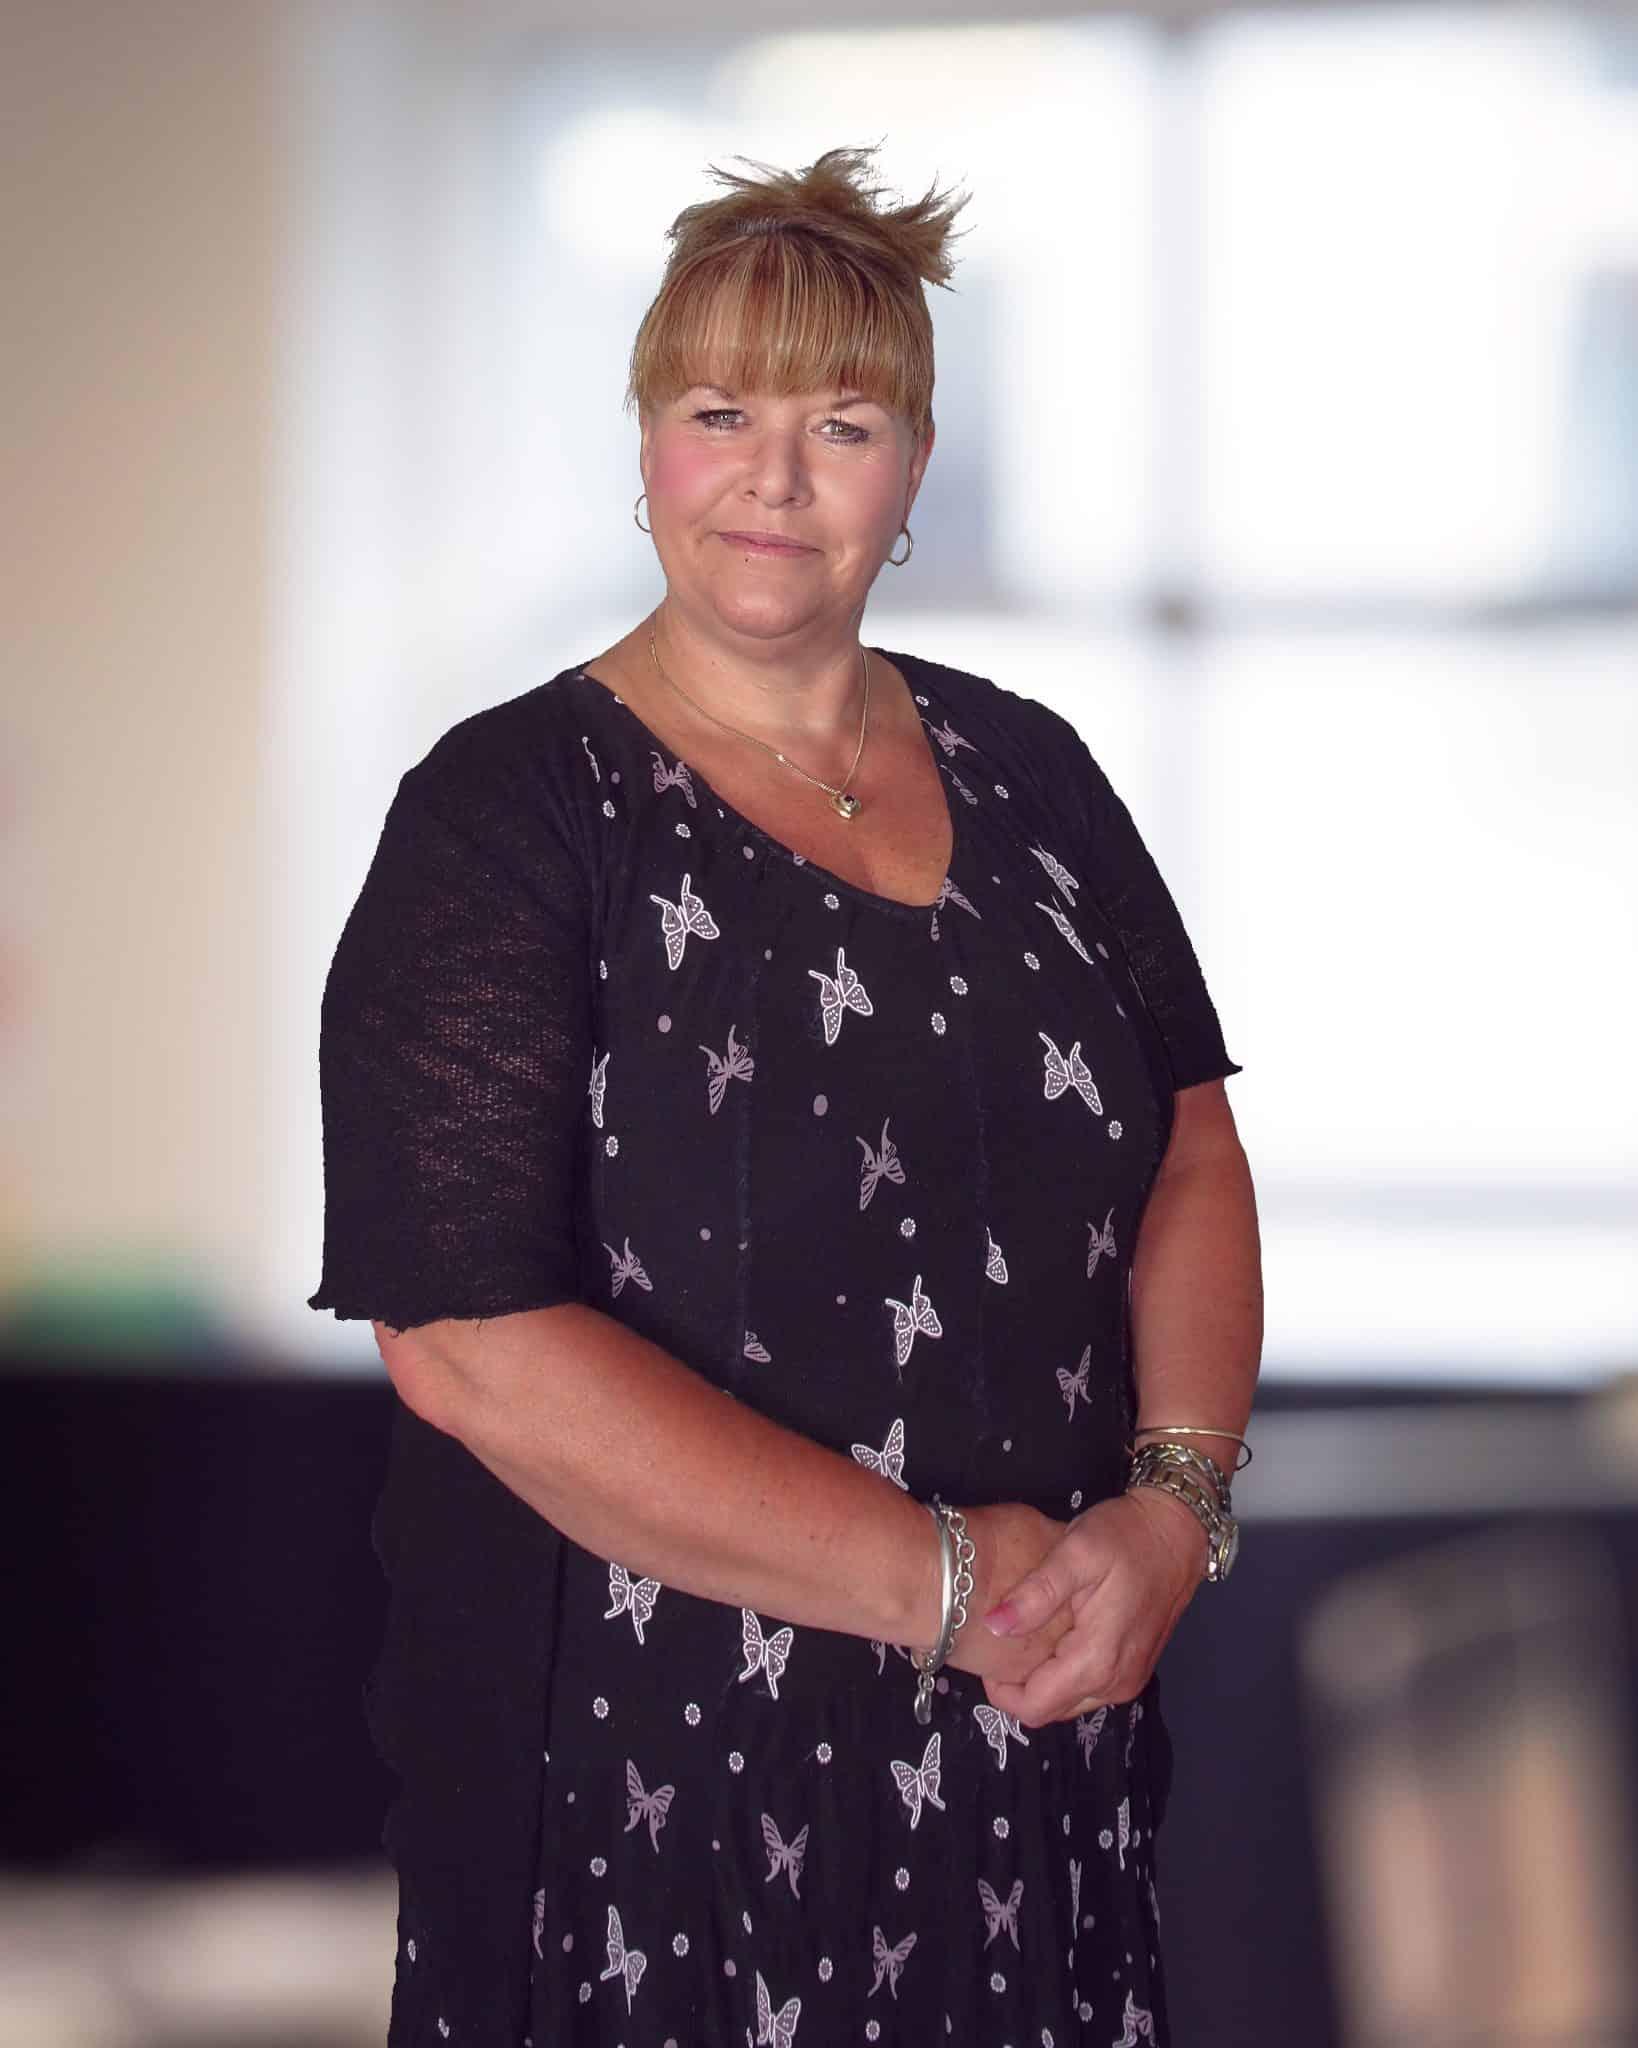 Karen Bremner Client Liaison & Office Support